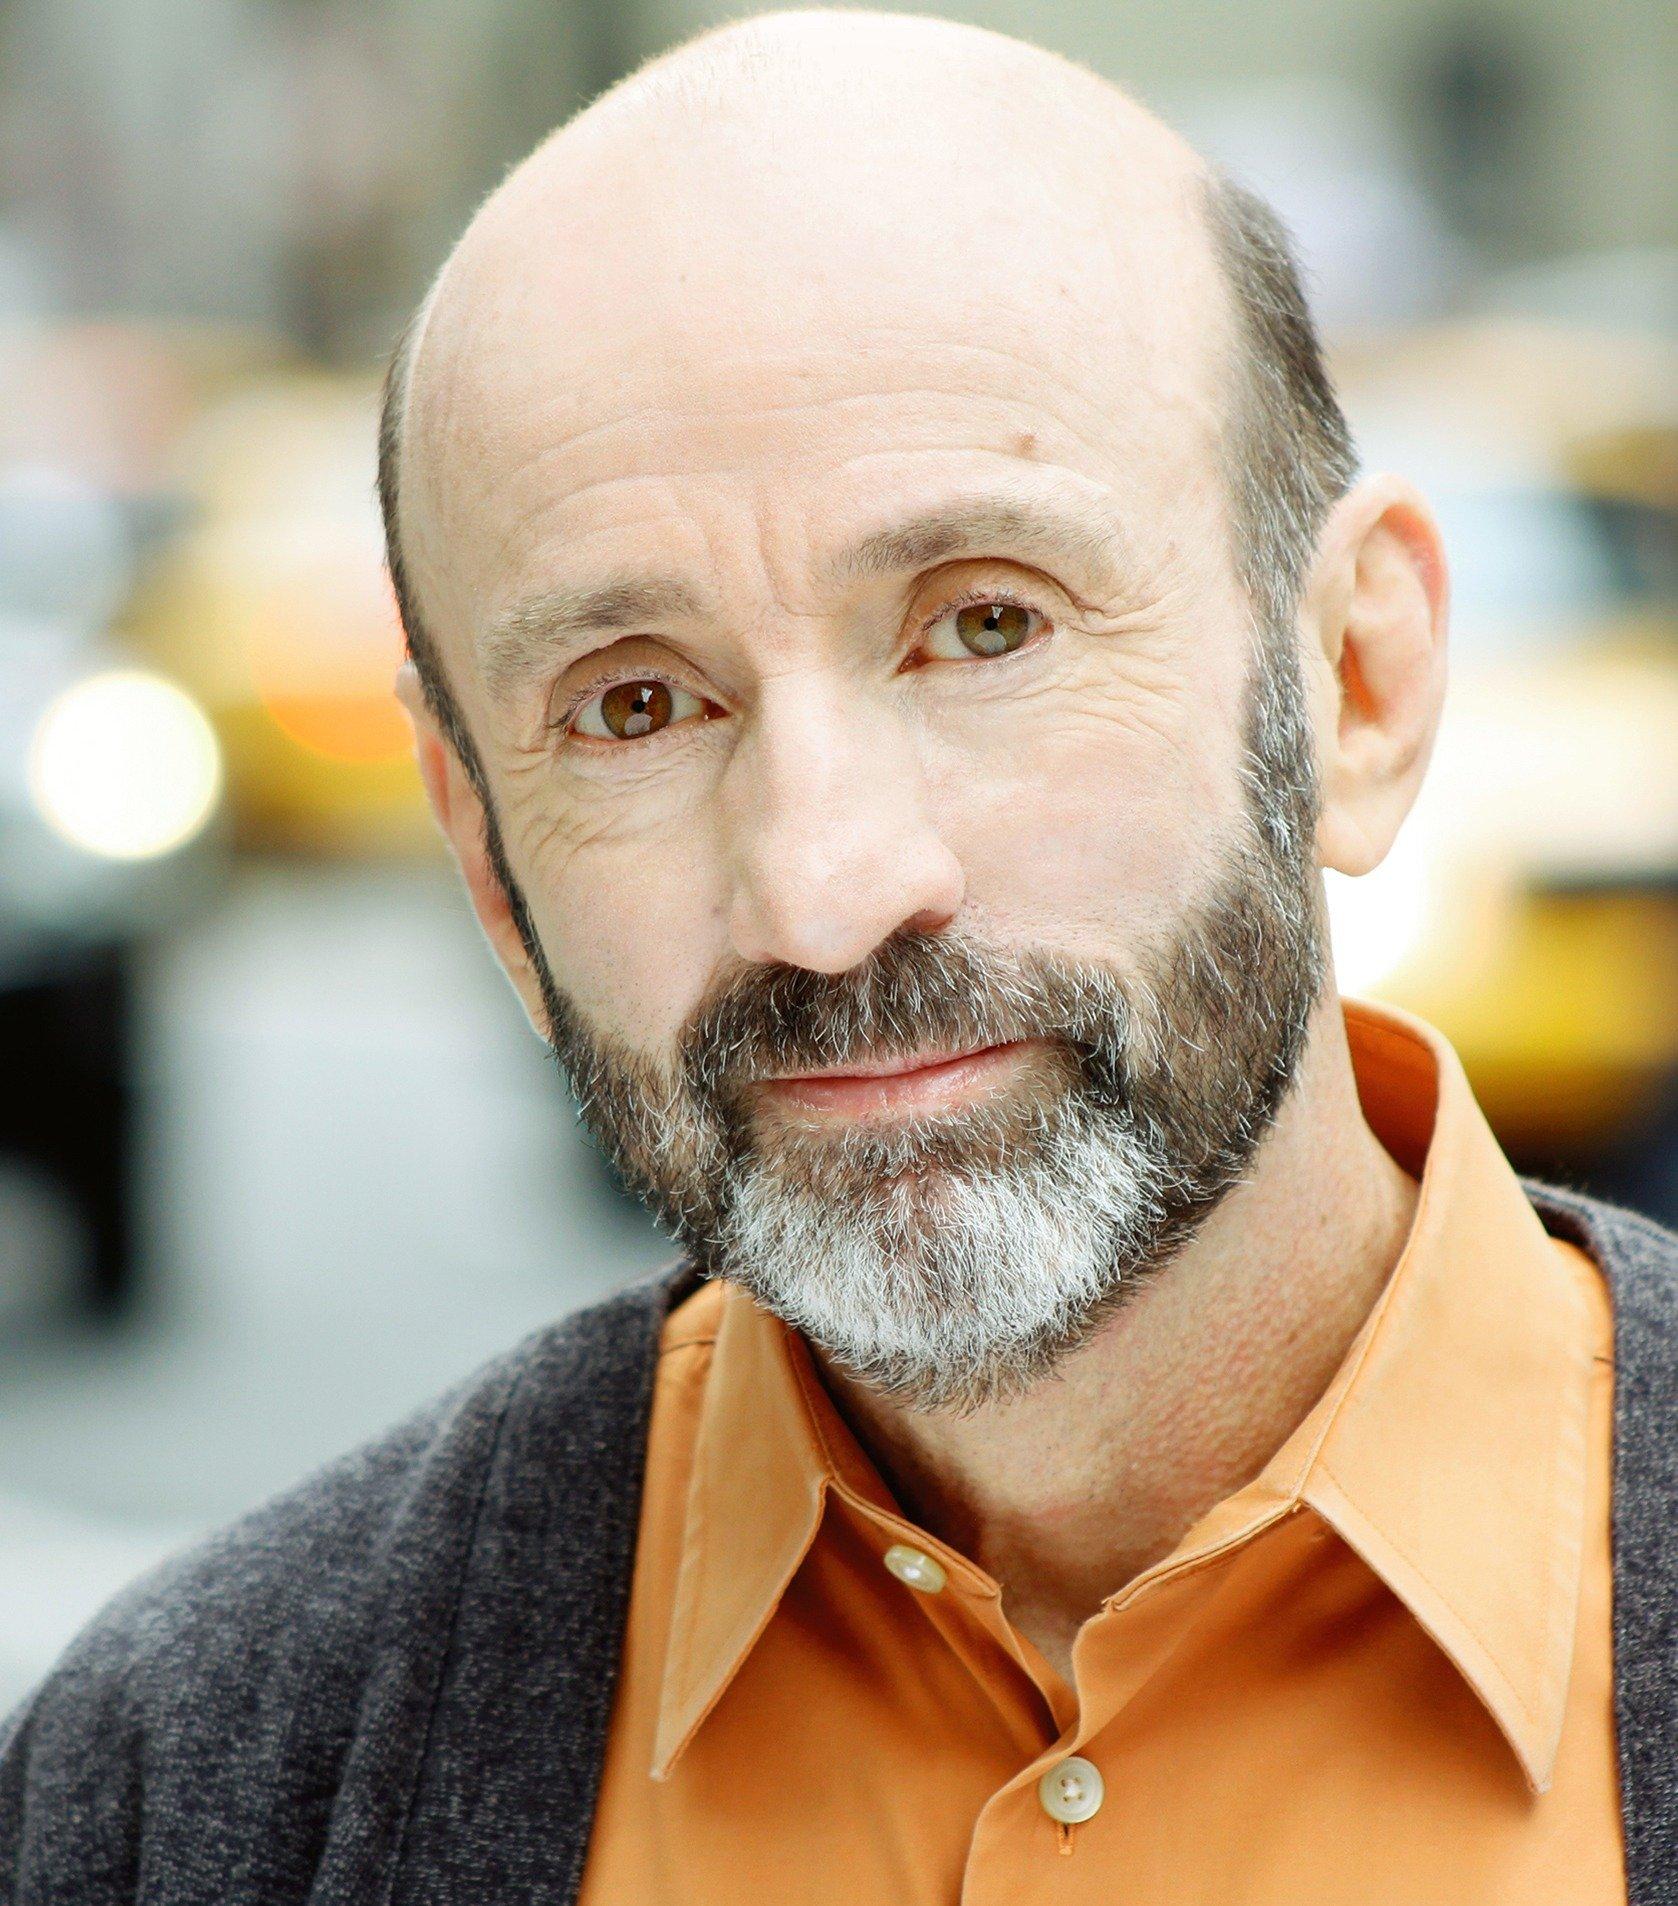 Patrick Kerr in 2016, beard